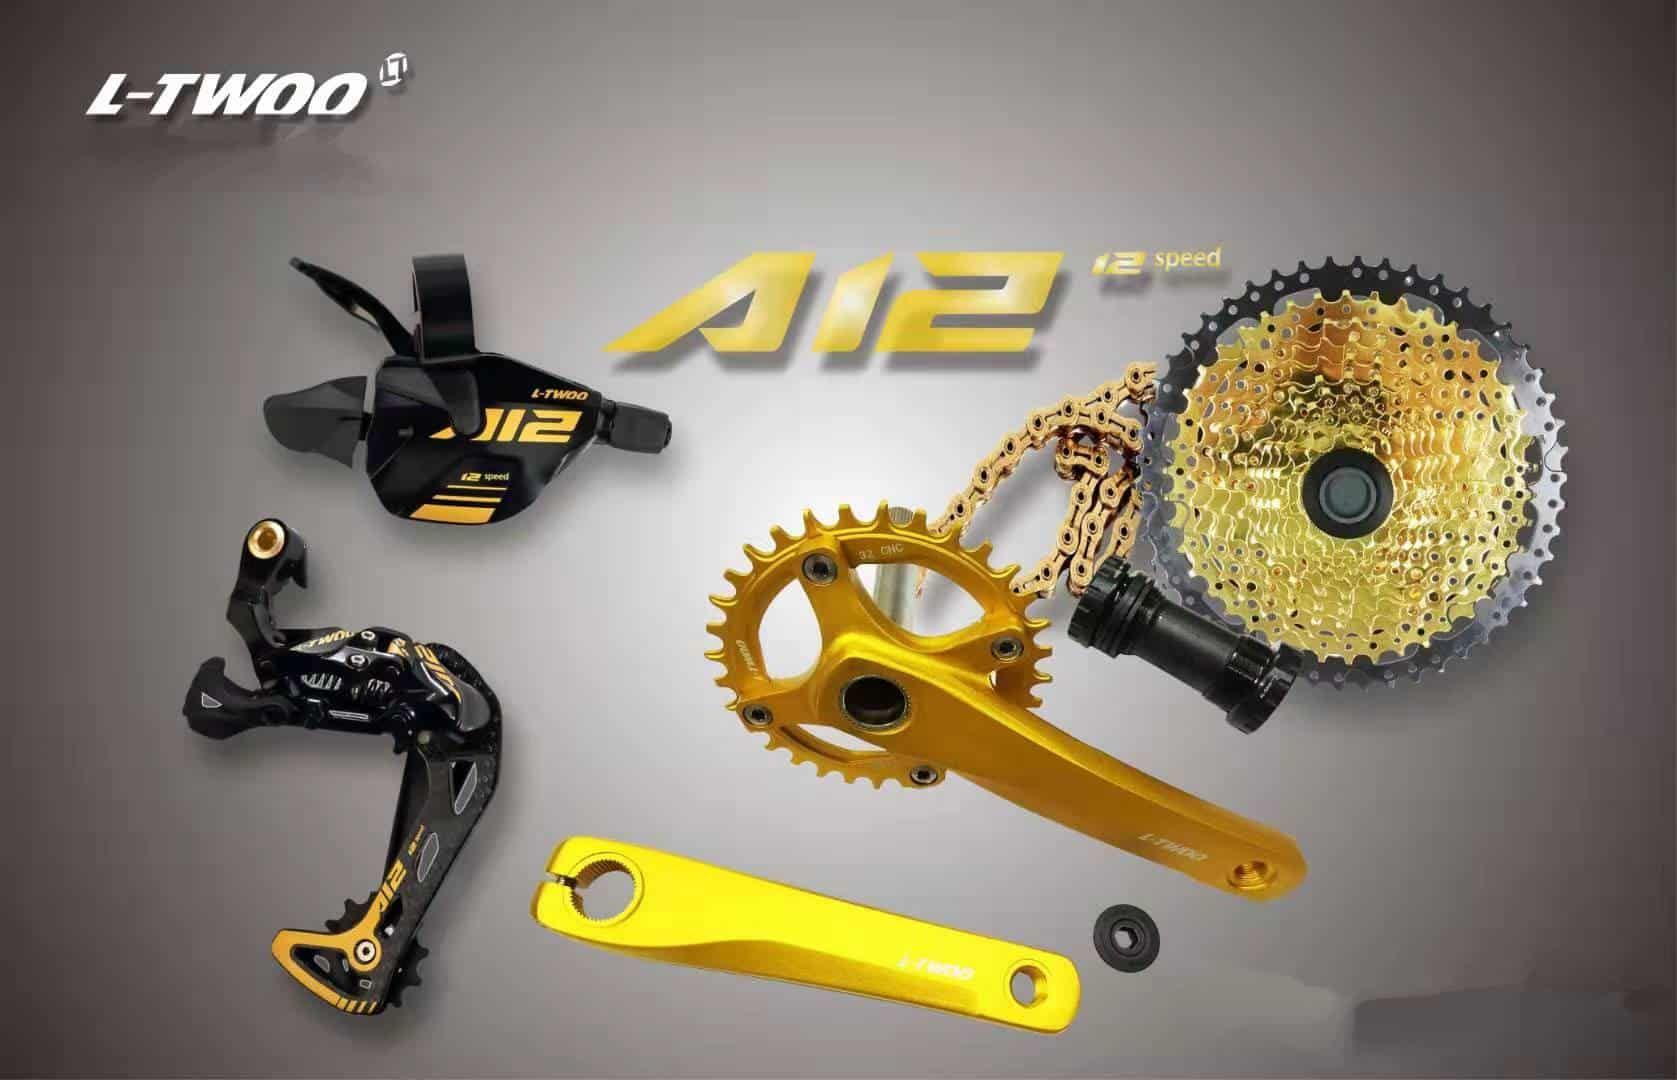 Mini Groupset Ltwoo Gold Edition Komponen Sepeda Produk Sepeda